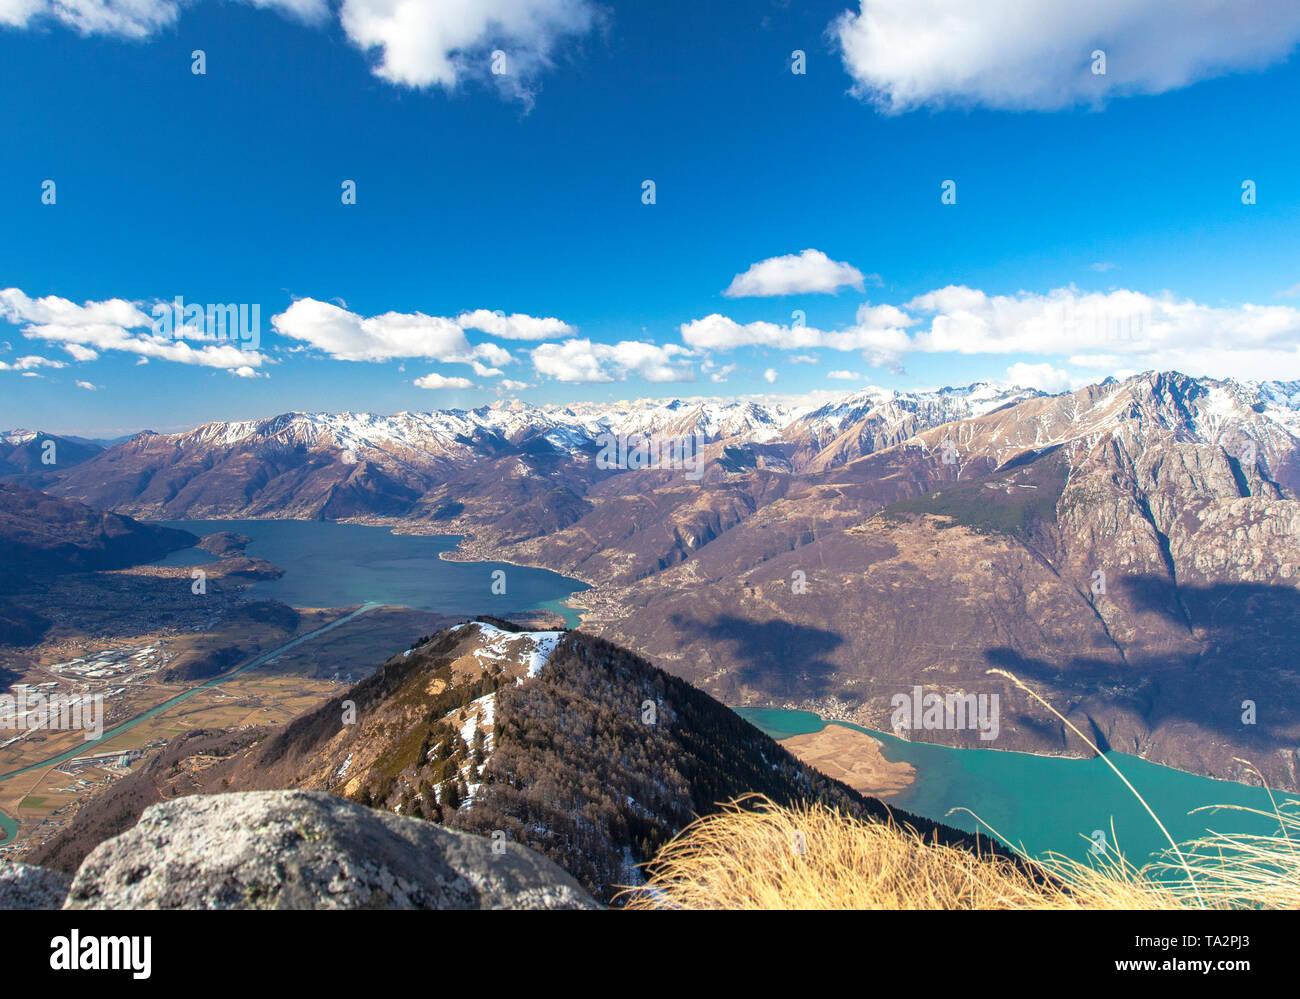 Panoramic of Lake Como and Valchiavenna from Monte Brusada, Rhaetian Alps, Sondrio province, Lower Valtellina, Lombardy, Italy Stock Photo